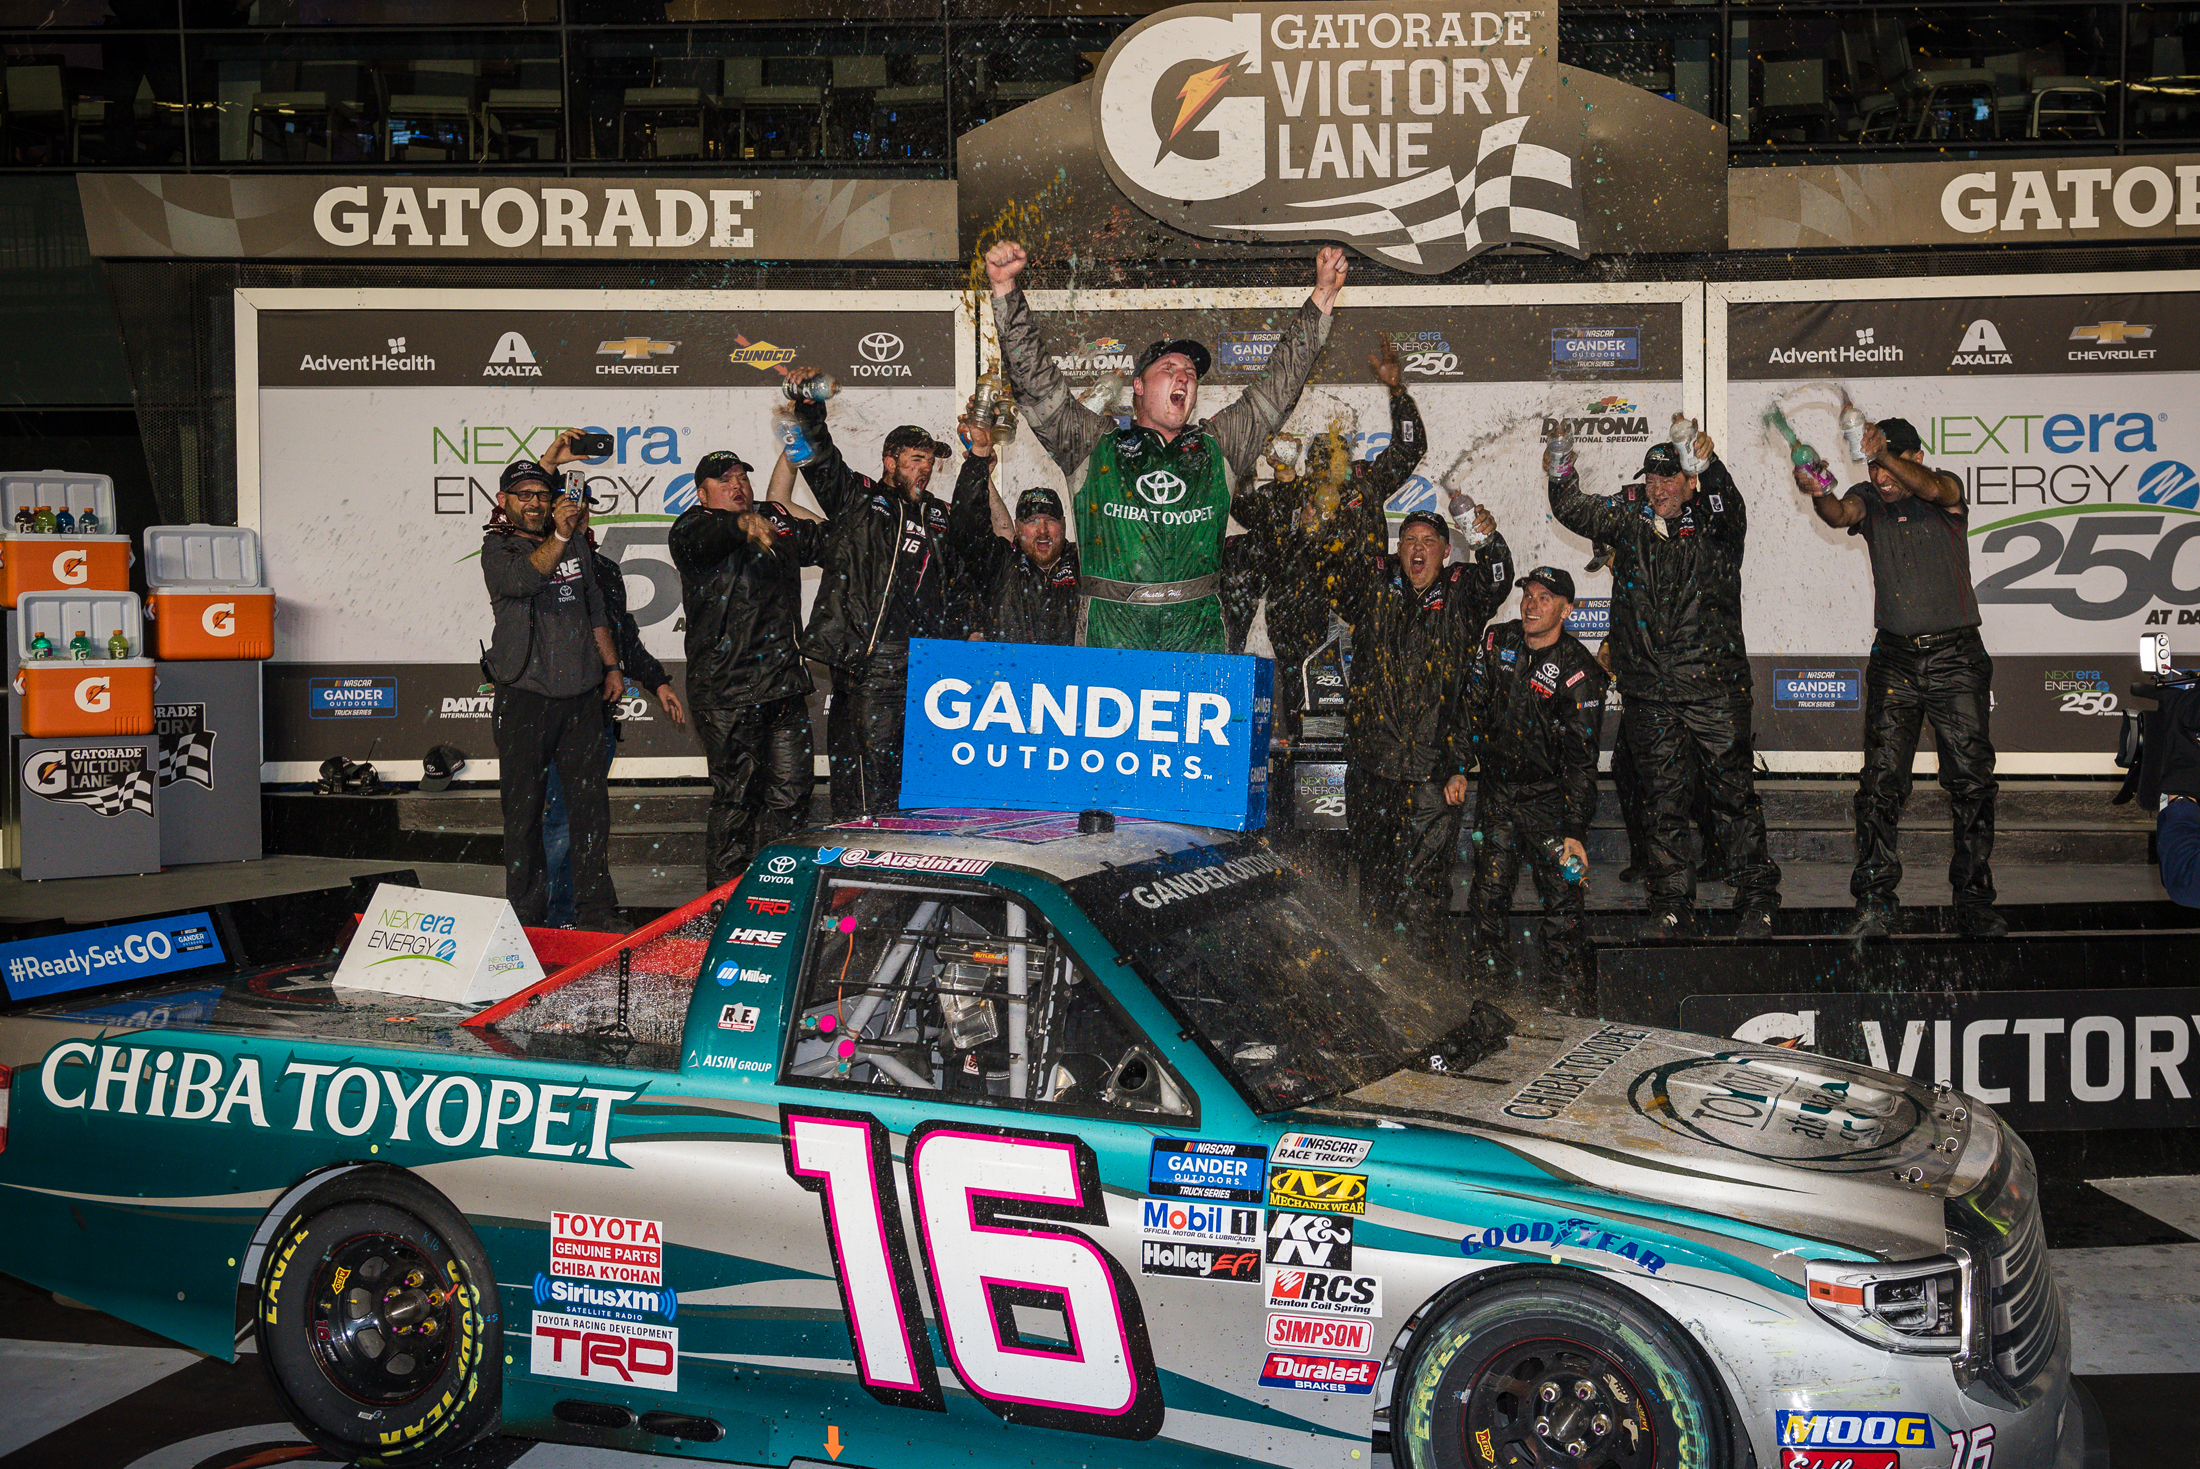 Feb. 15: Daytona Int'l Speedway - Start: 10thFinish: WIN